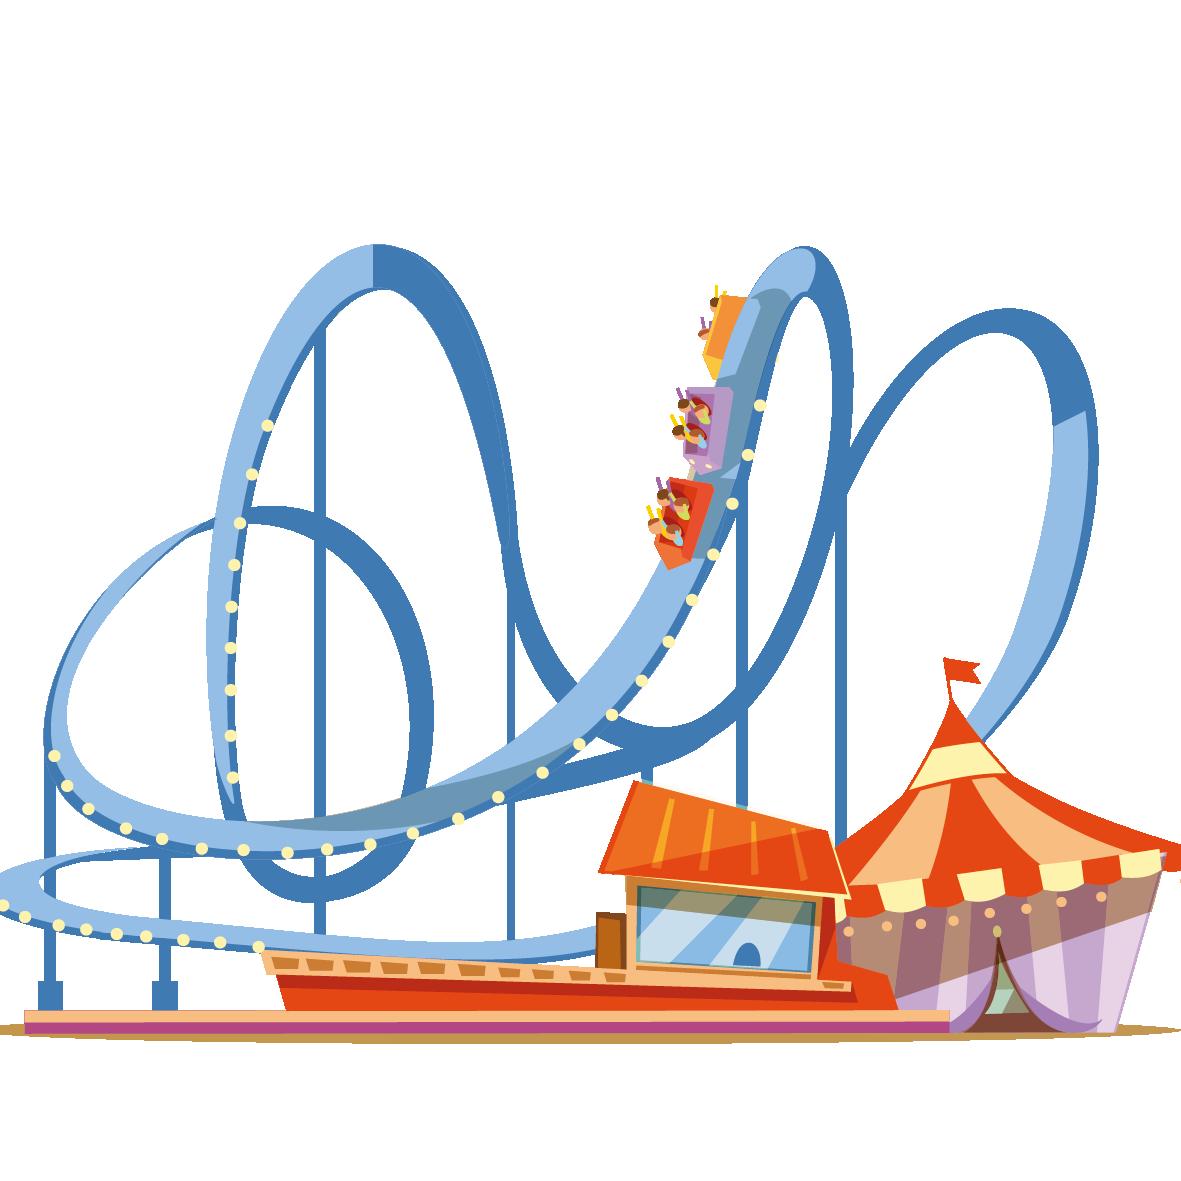 Coney island universal orlando. Rollercoaster clipart theme park